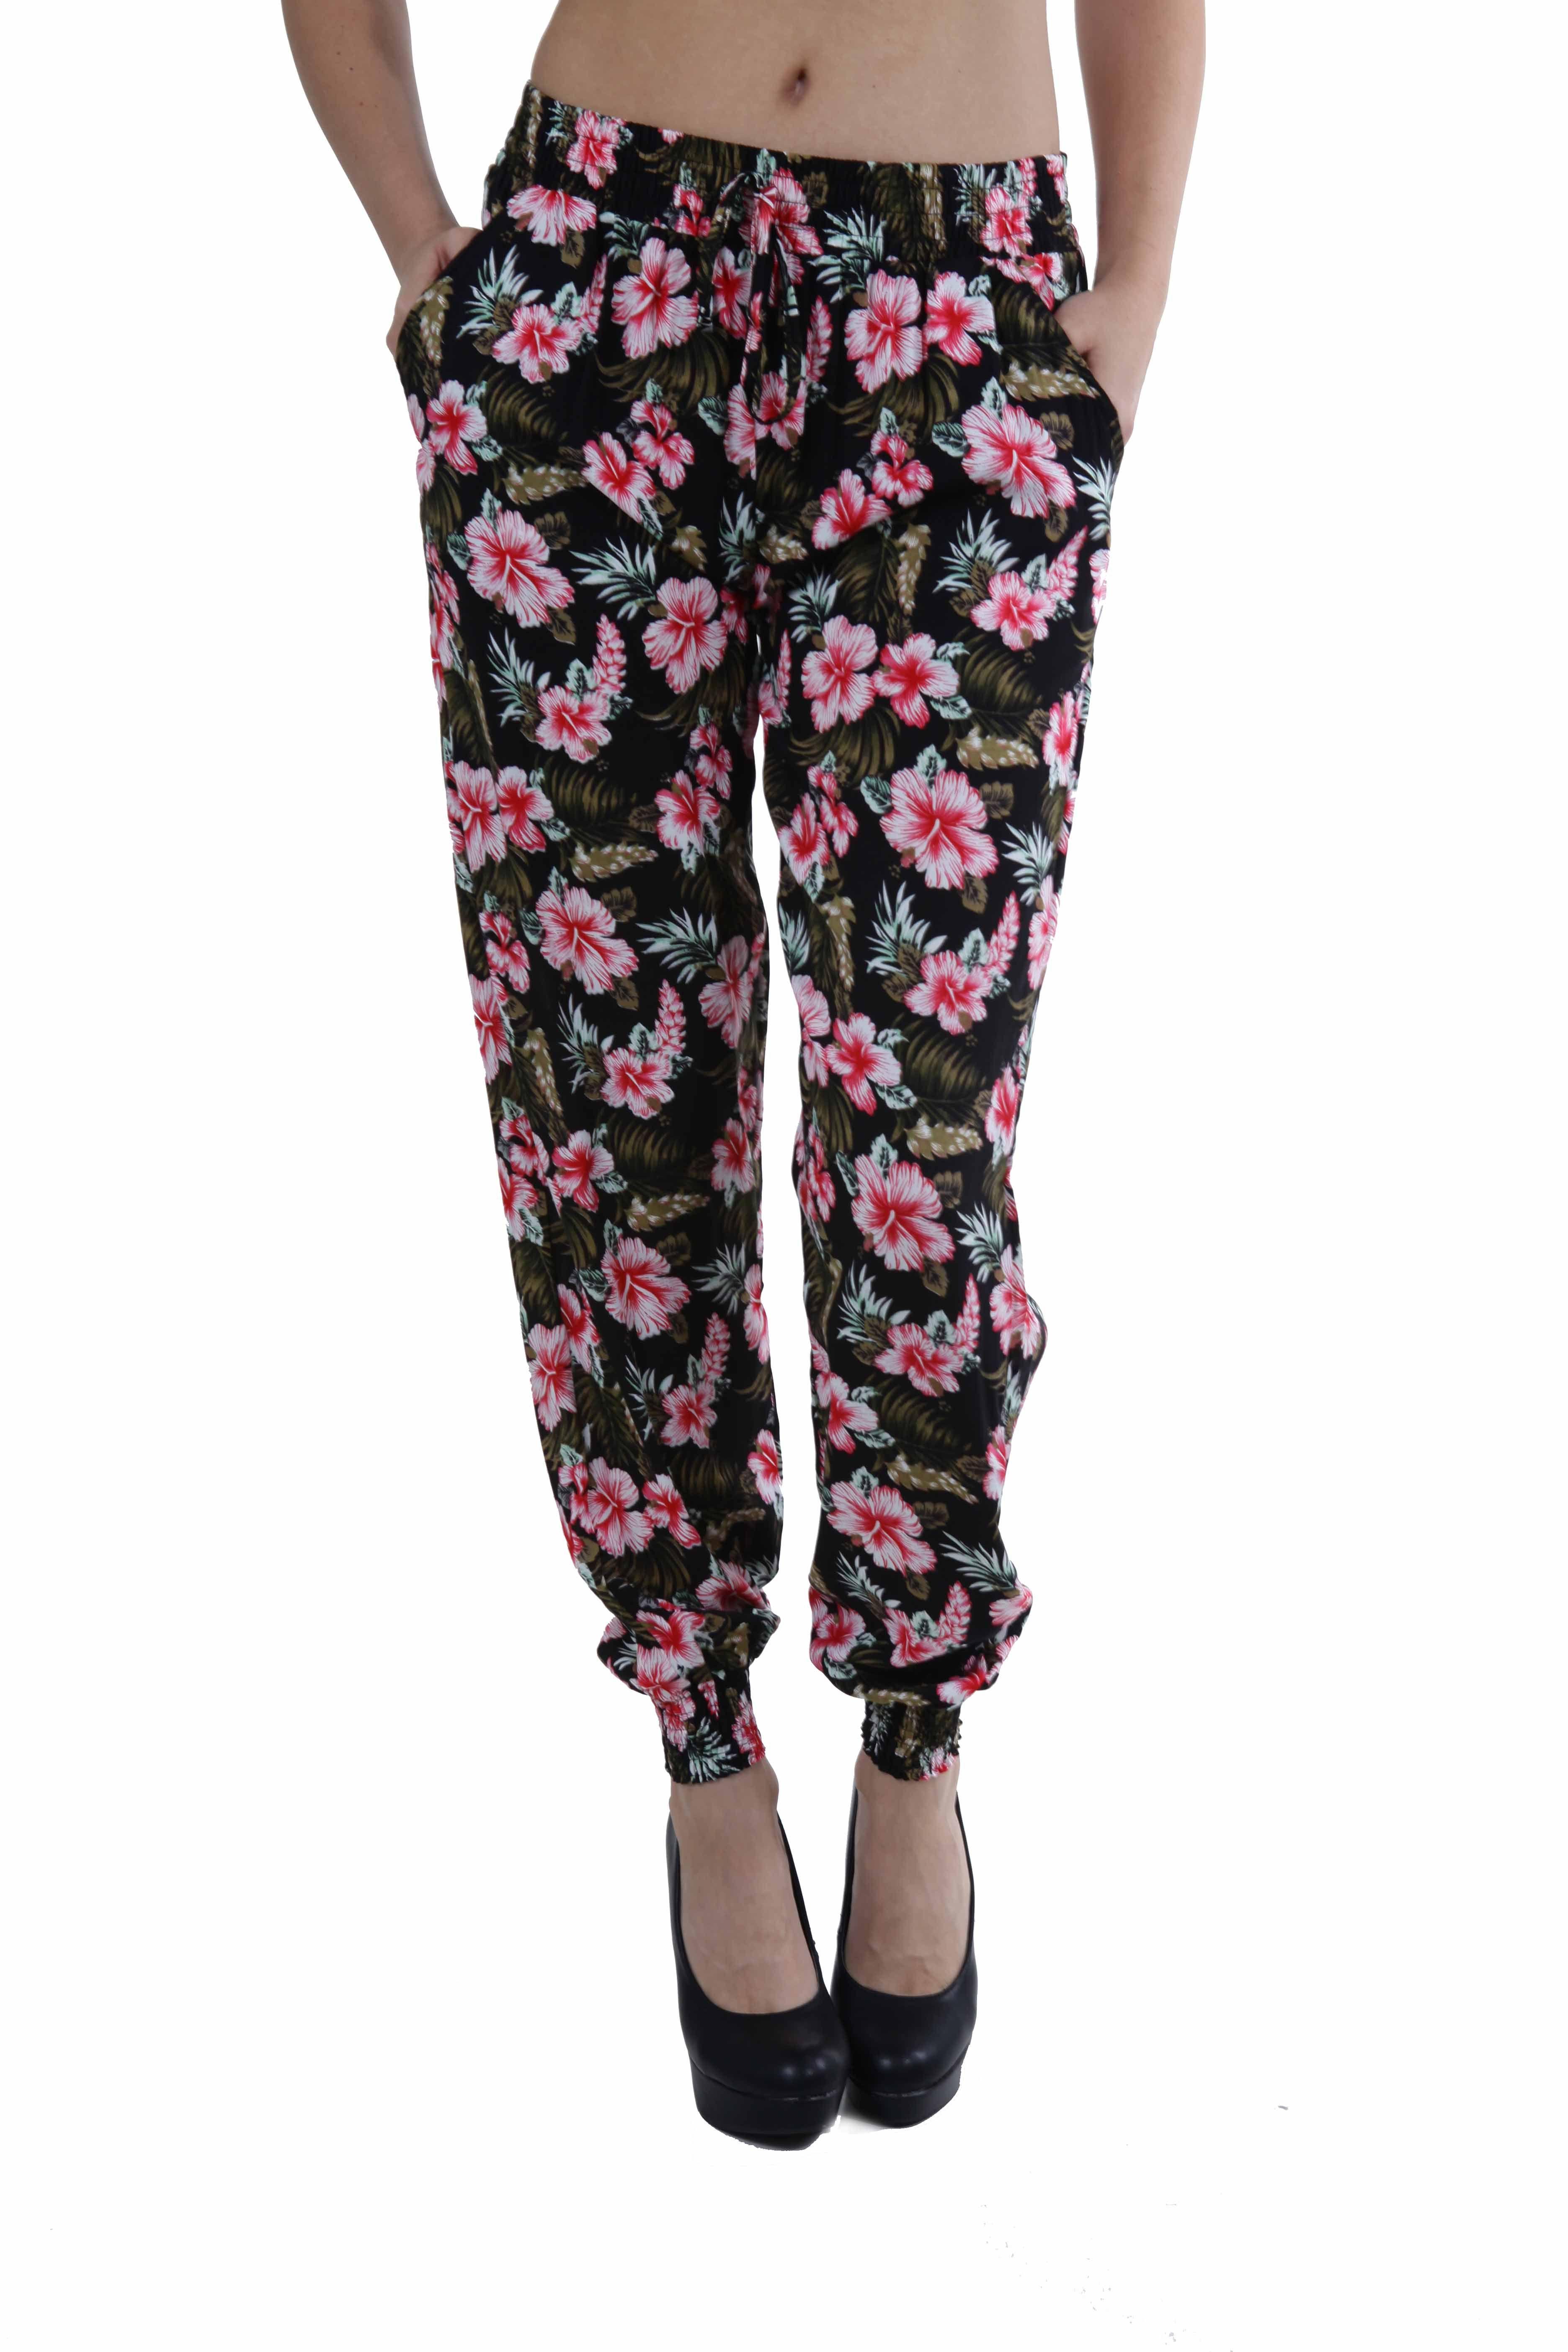 Pantalones Sueltos 3 Http Facebook Com Matildabytruelove Http Matildabytruelove Com Fashion Pajama Pants Style